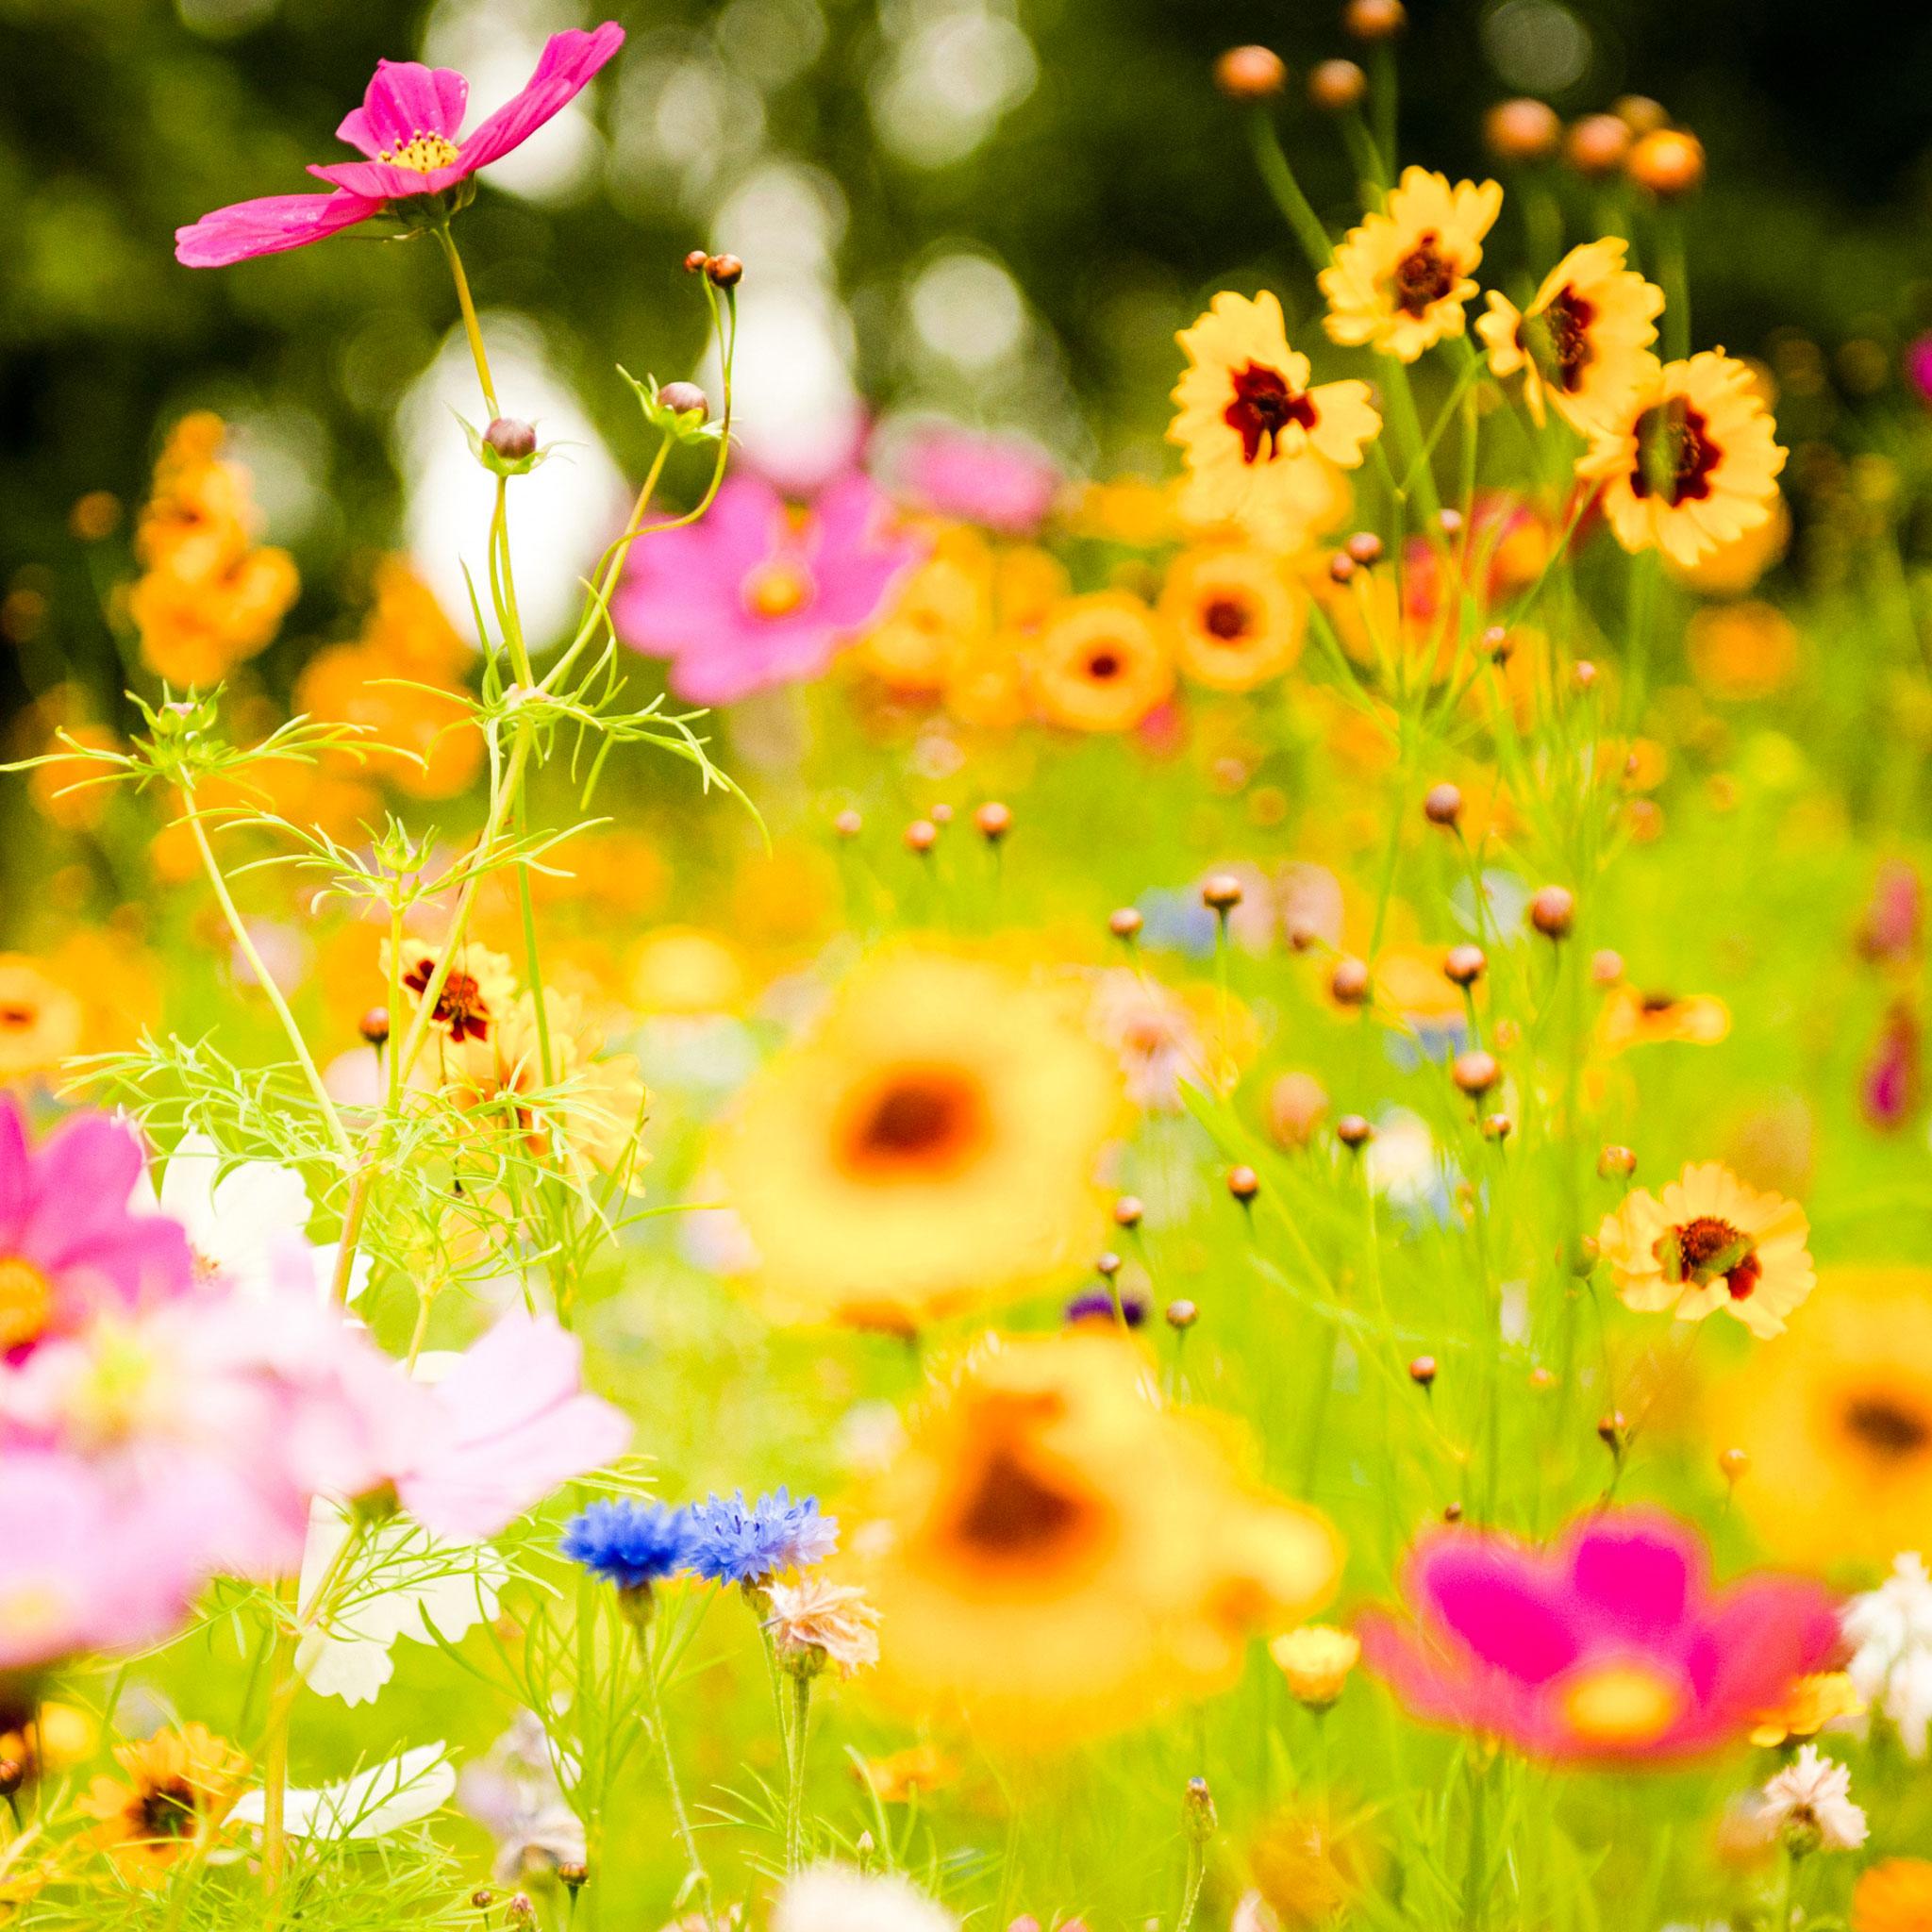 Land Flowers 3Wallpapers ipad Retina Land Flowers   iPad Retina